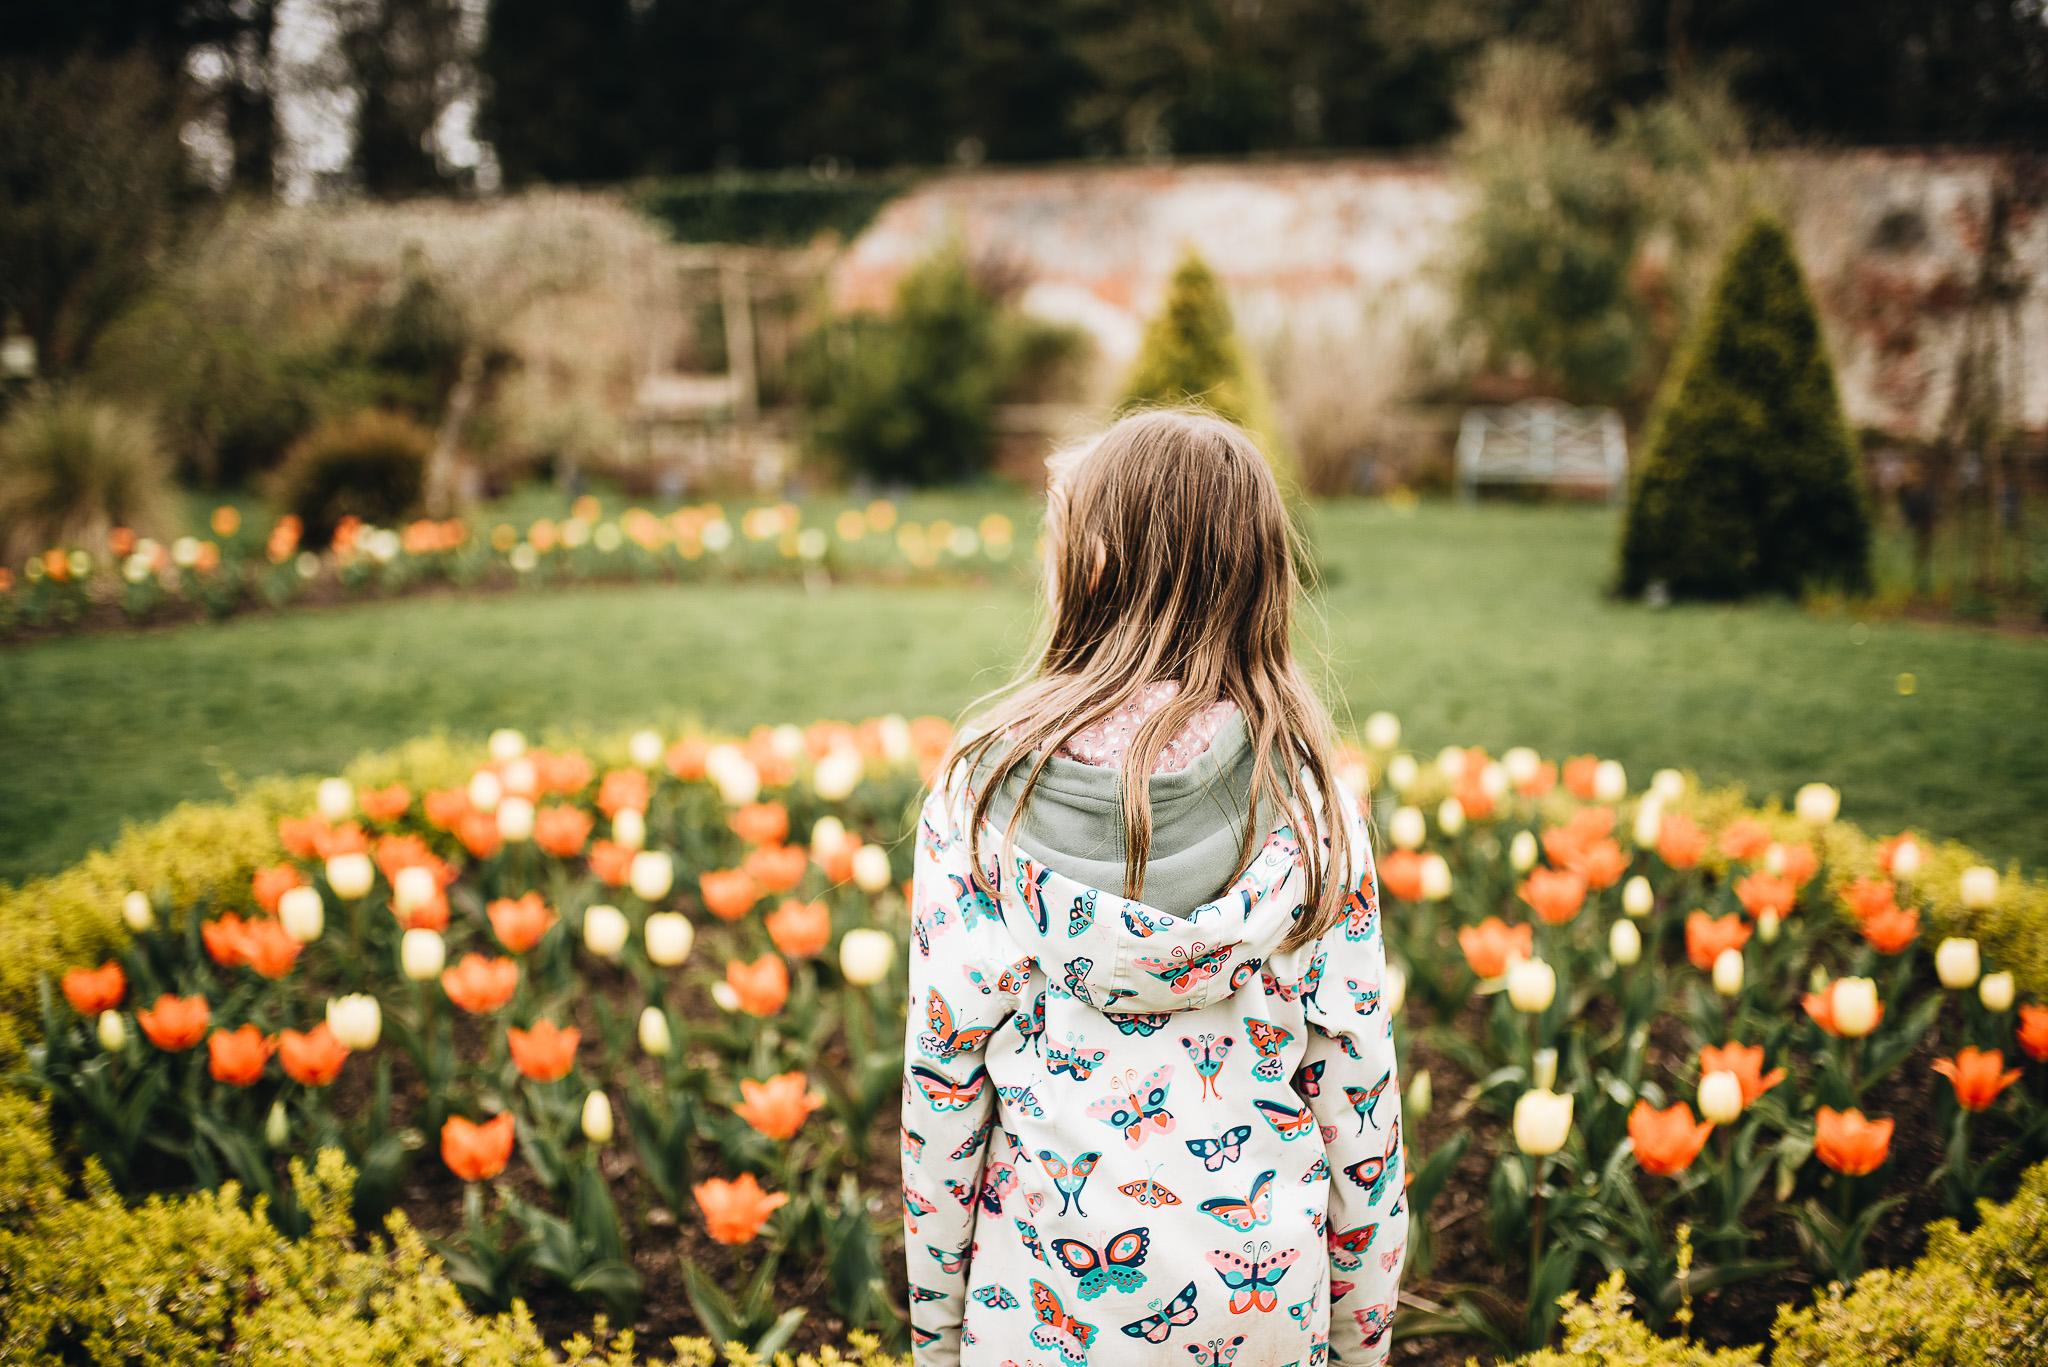 In the Walled Garden